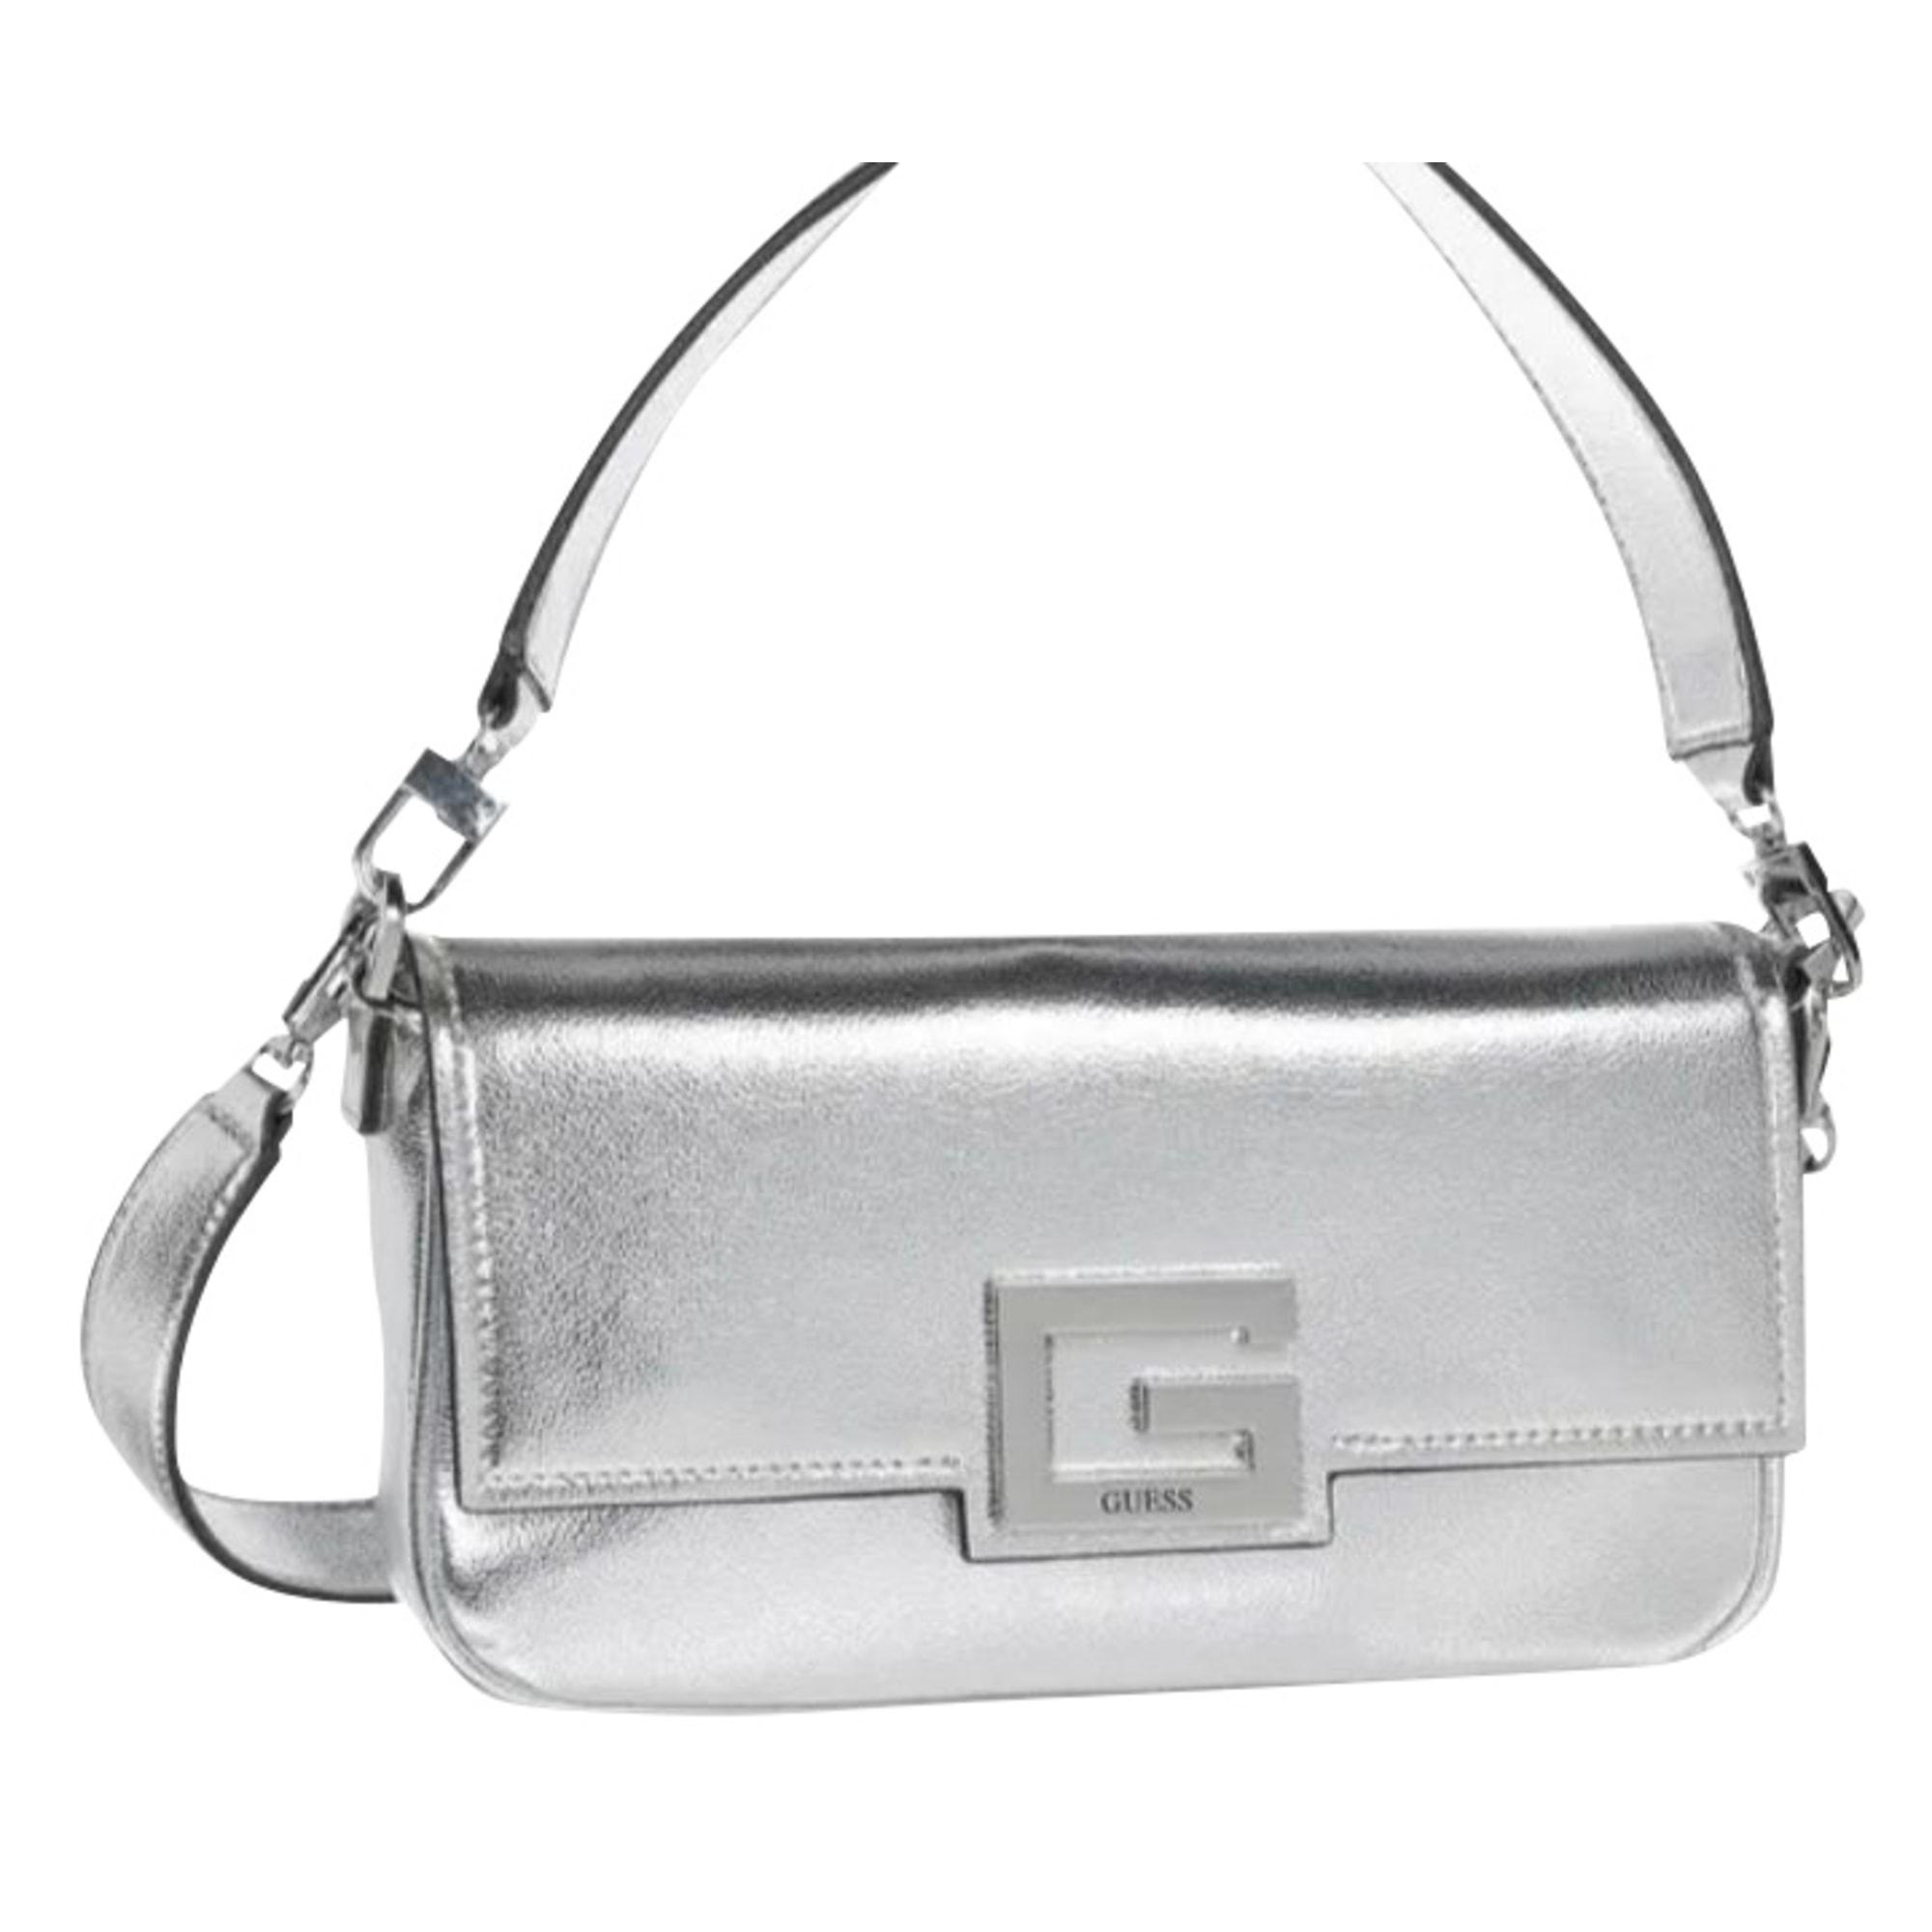 Leather Shoulder Bag GUESS Silver